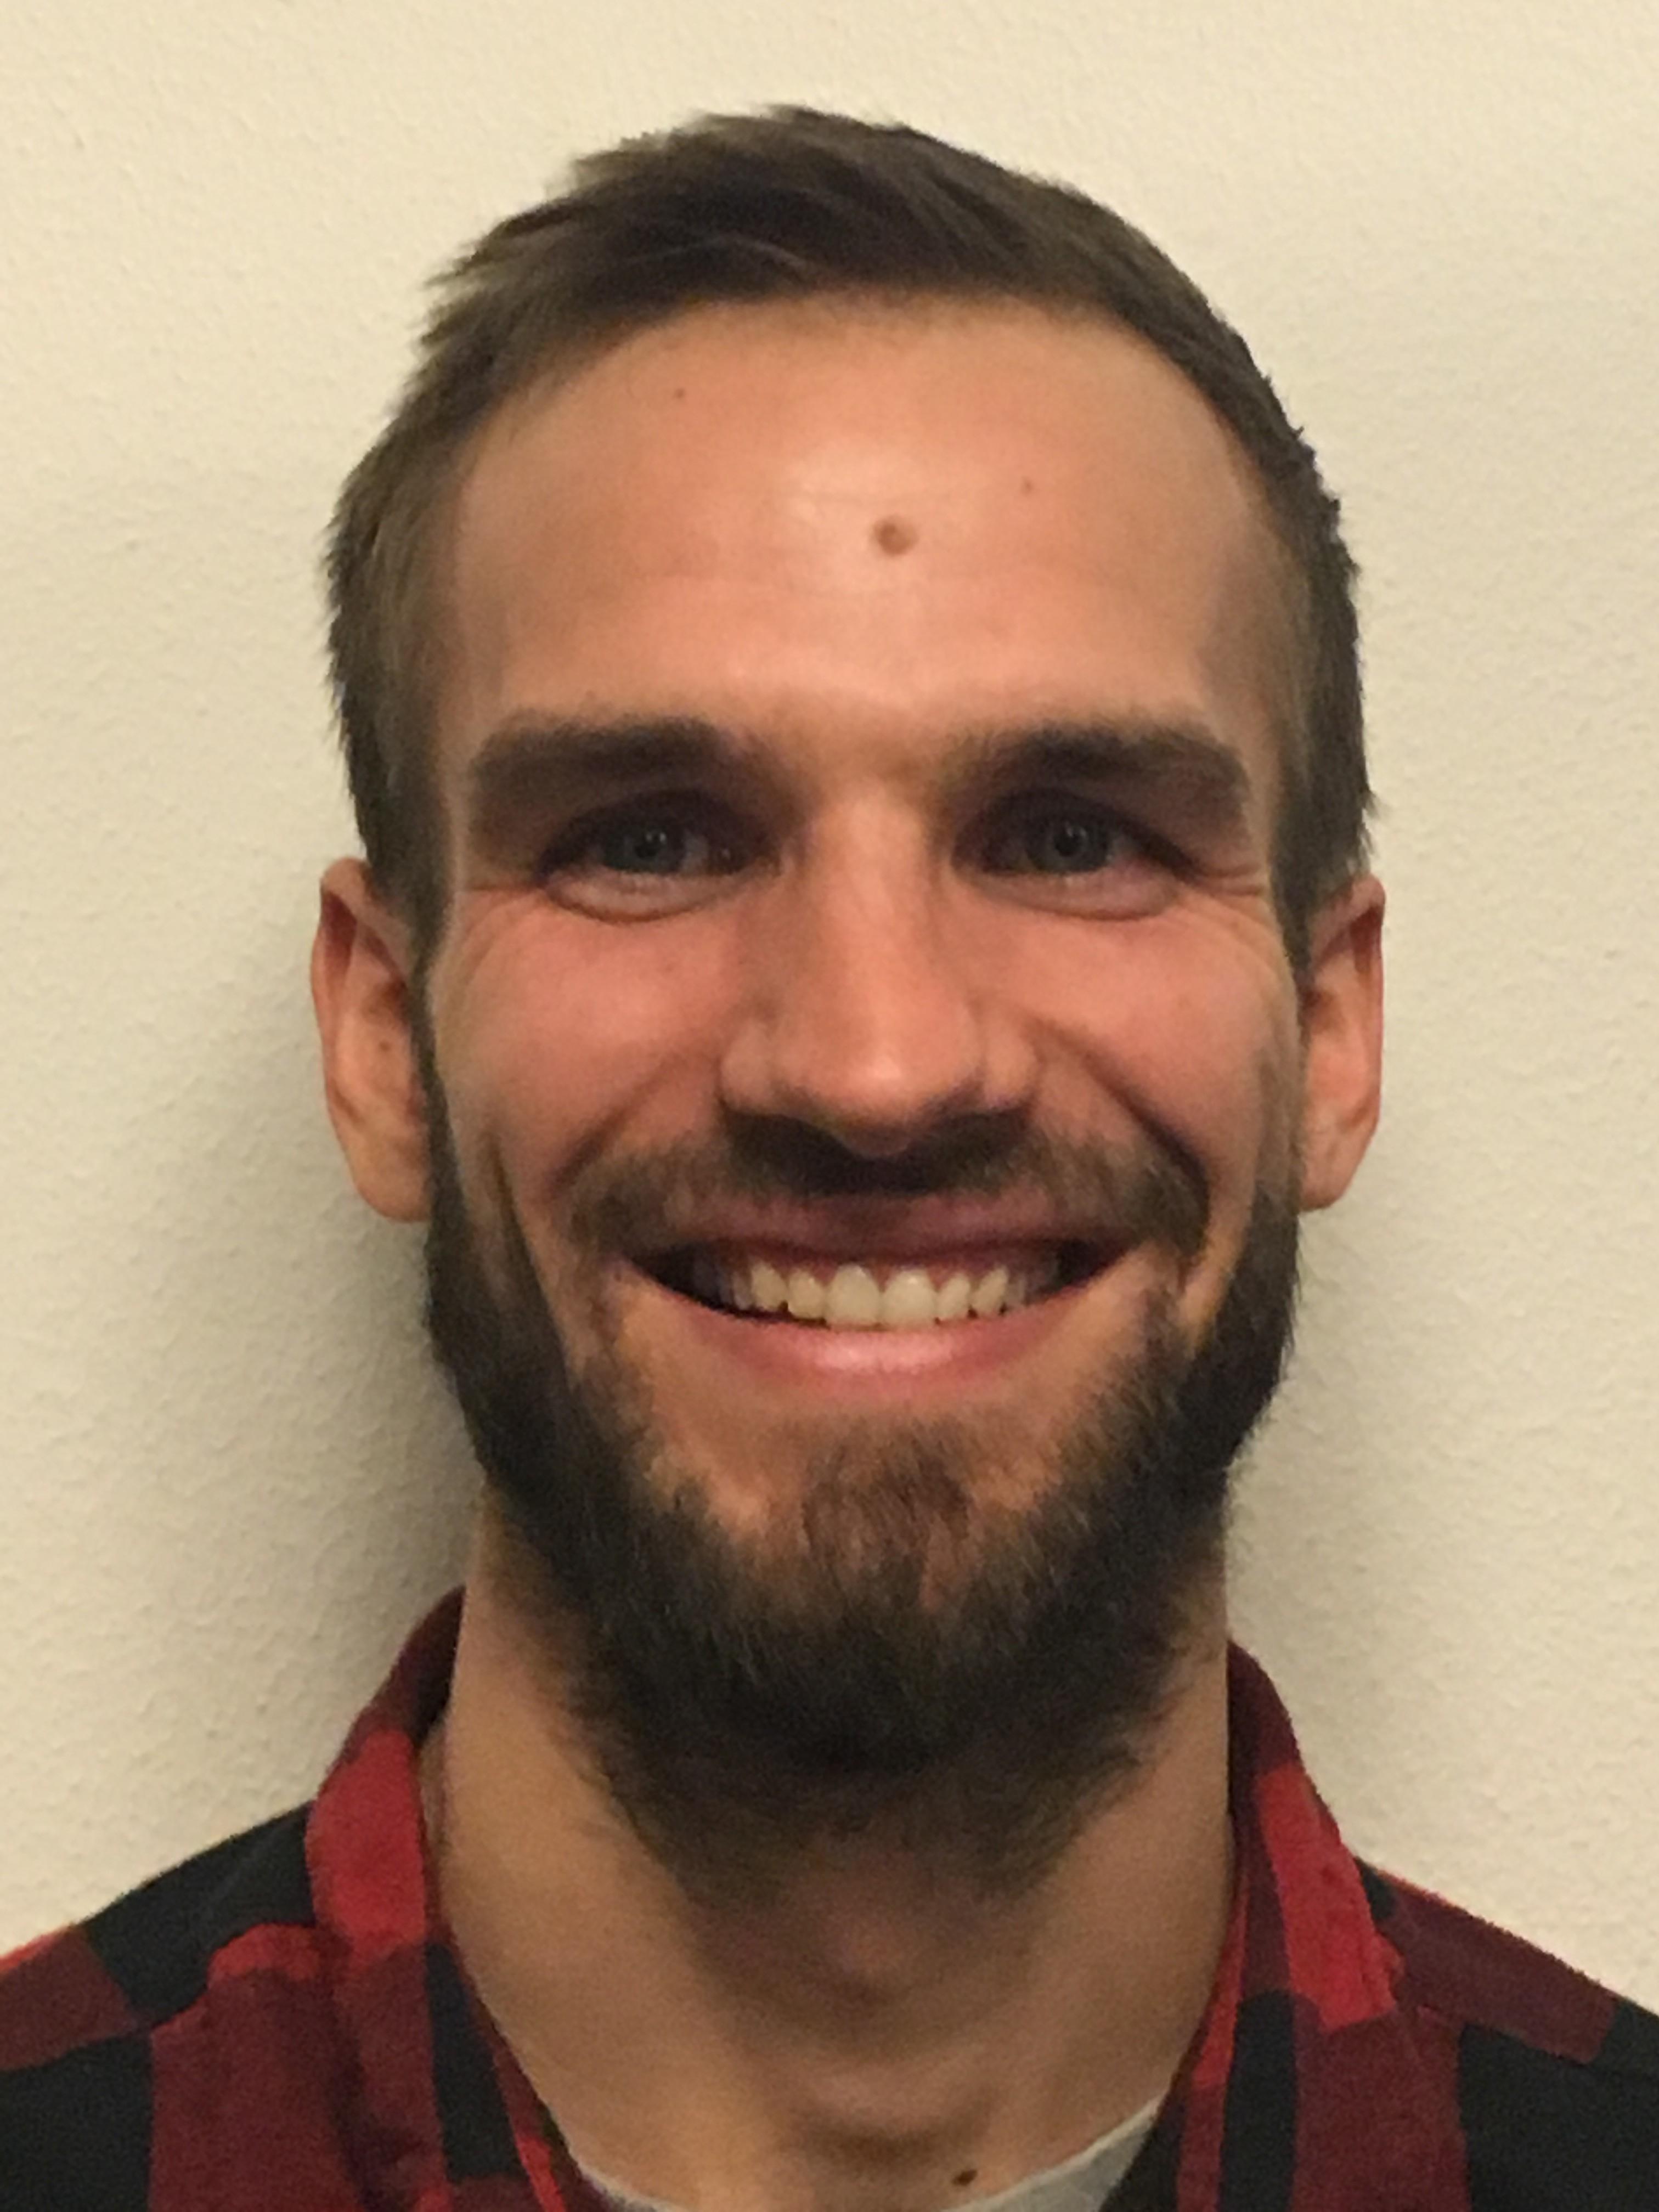 Mikkel Højgaard Larsen